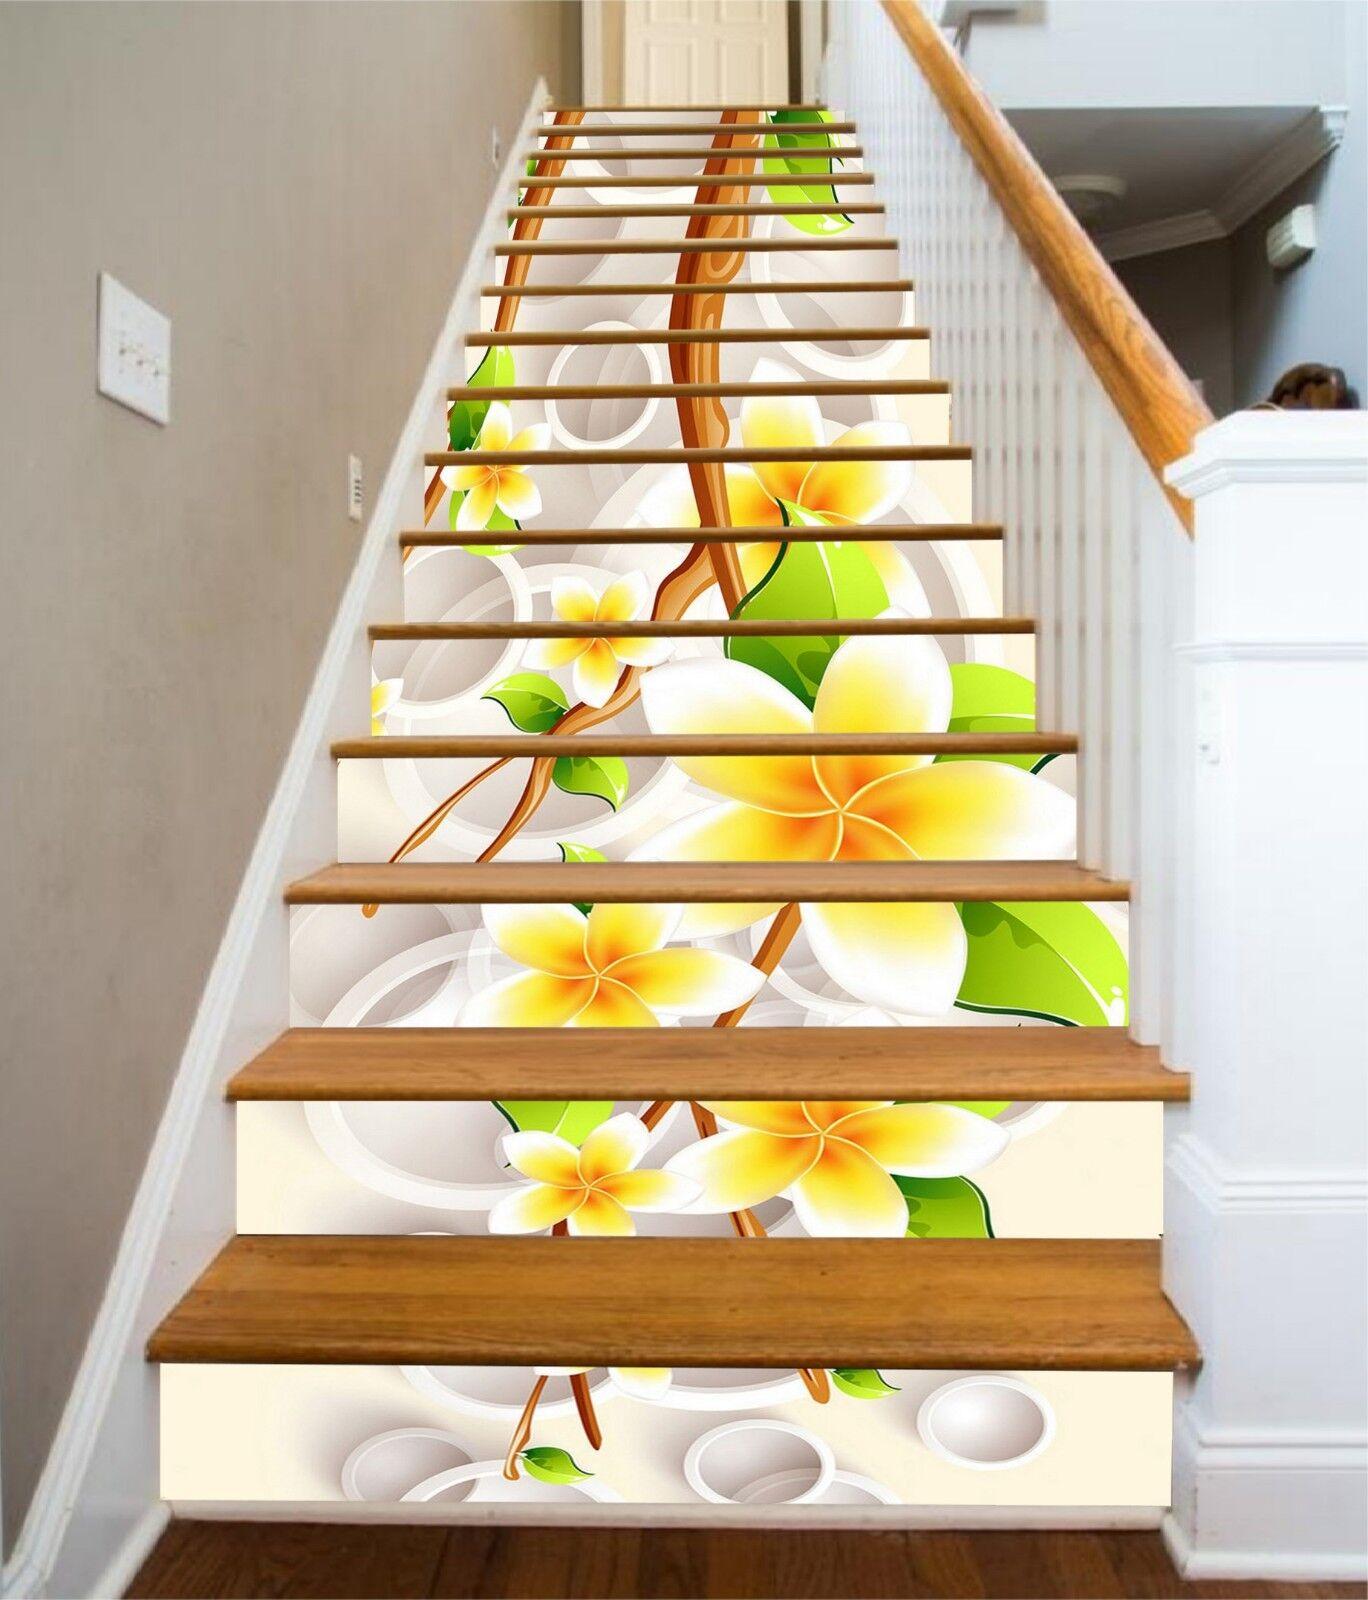 3D Gelb Petals Stair Risers Decoration Photo Mural Vinyl Decal WandPapier UK